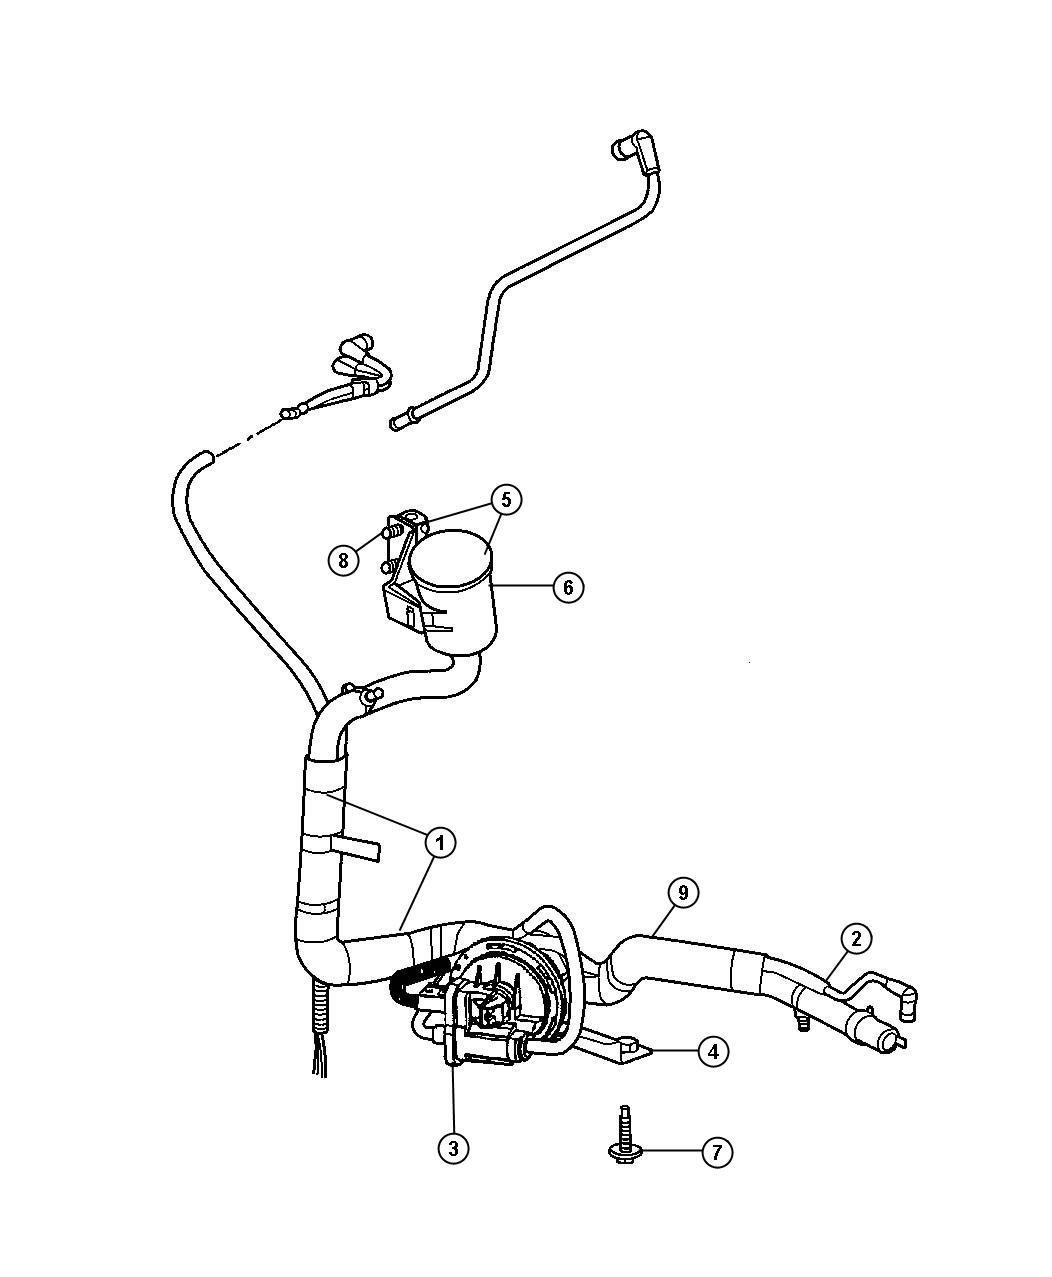 Dodge Grand Caravan Harness Nvld To Filter Pump Exhaust